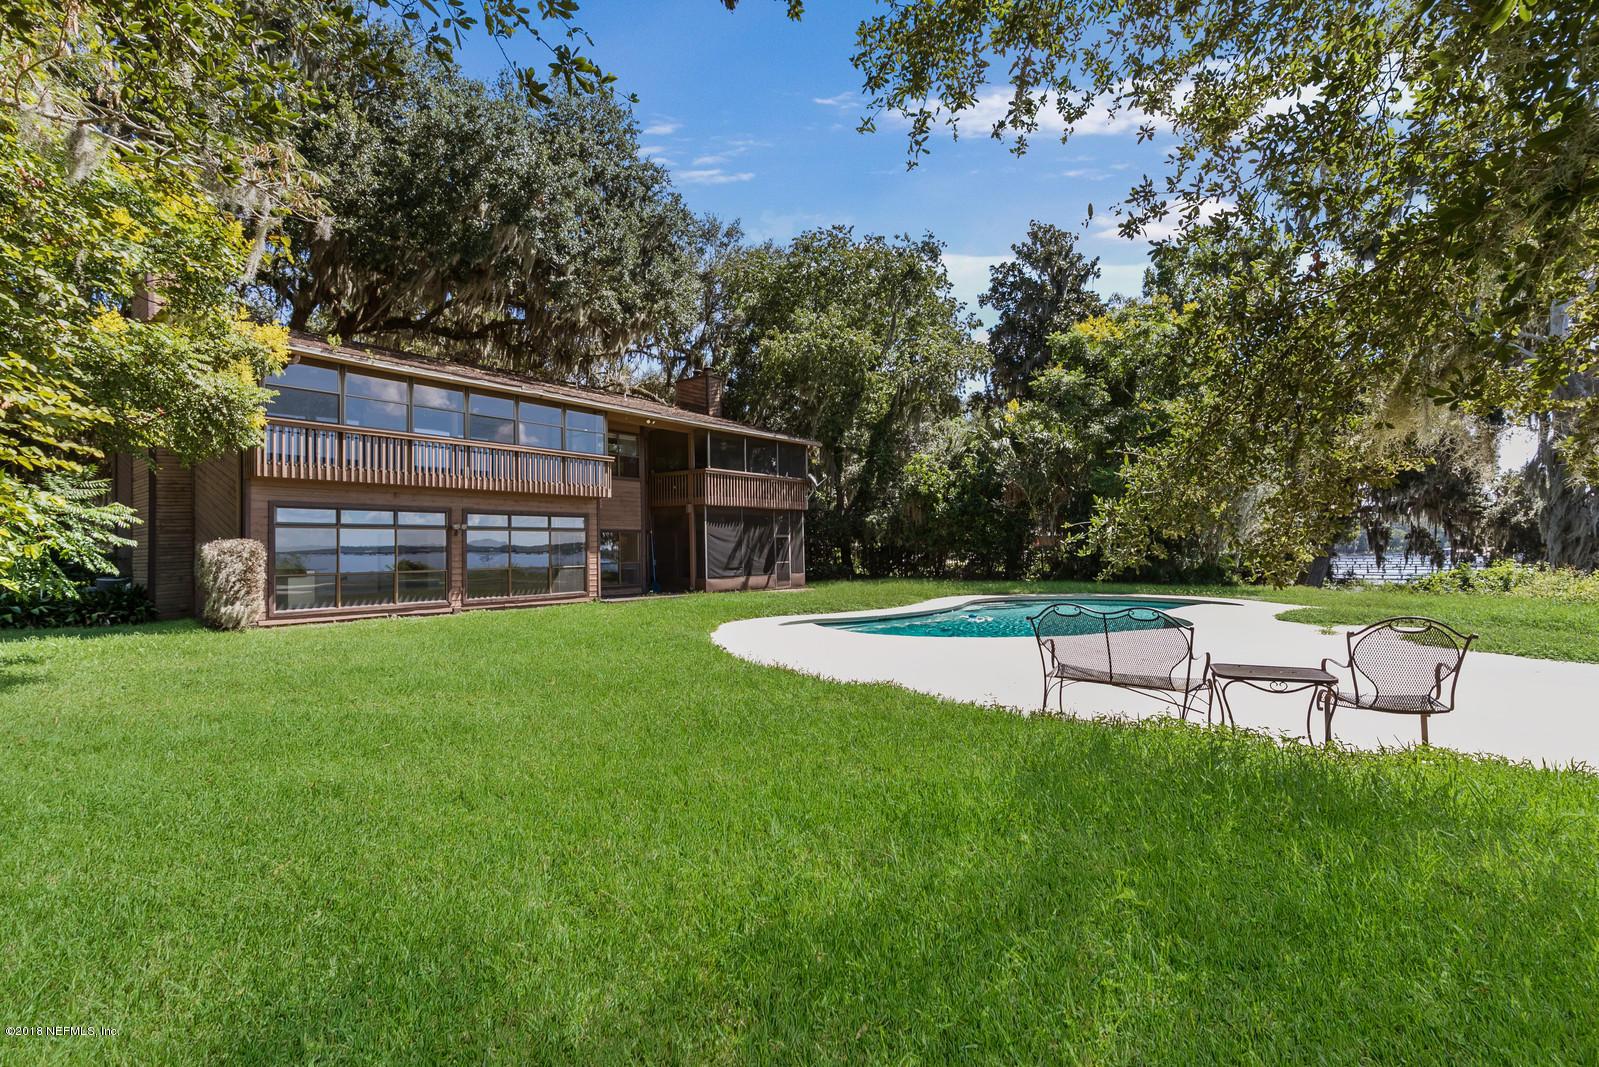 2724 SCOTT MILL, JACKSONVILLE, FLORIDA 32257, 5 Bedrooms Bedrooms, ,4 BathroomsBathrooms,Residential - single family,For sale,SCOTT MILL,959734